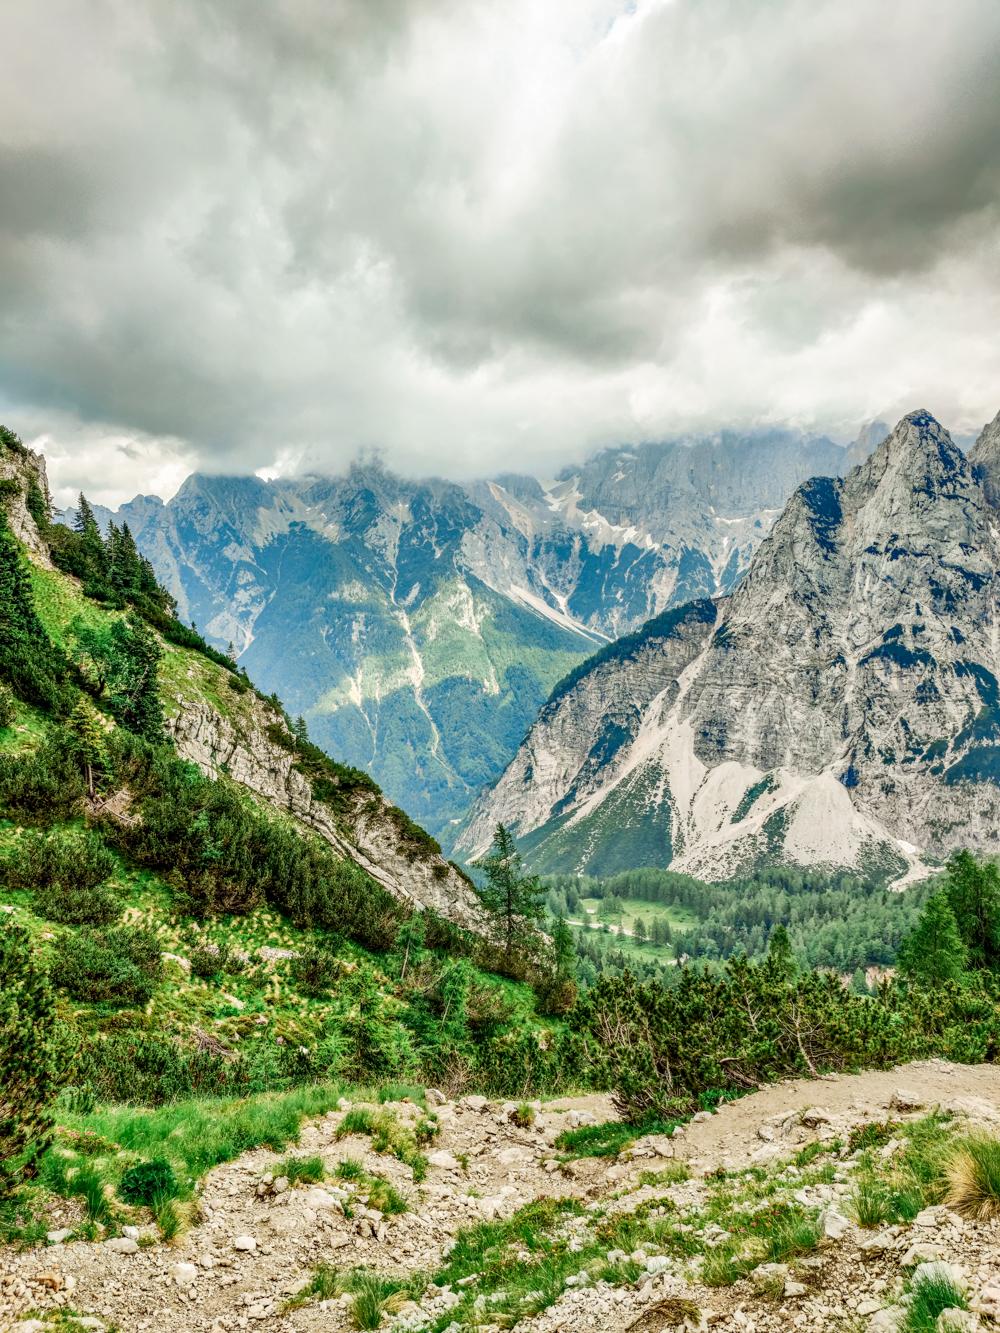 Slemenova Špica walking tour - 4-day Slovenia travel itinerary for the best outdoor adventures | Aliz's Wonderland